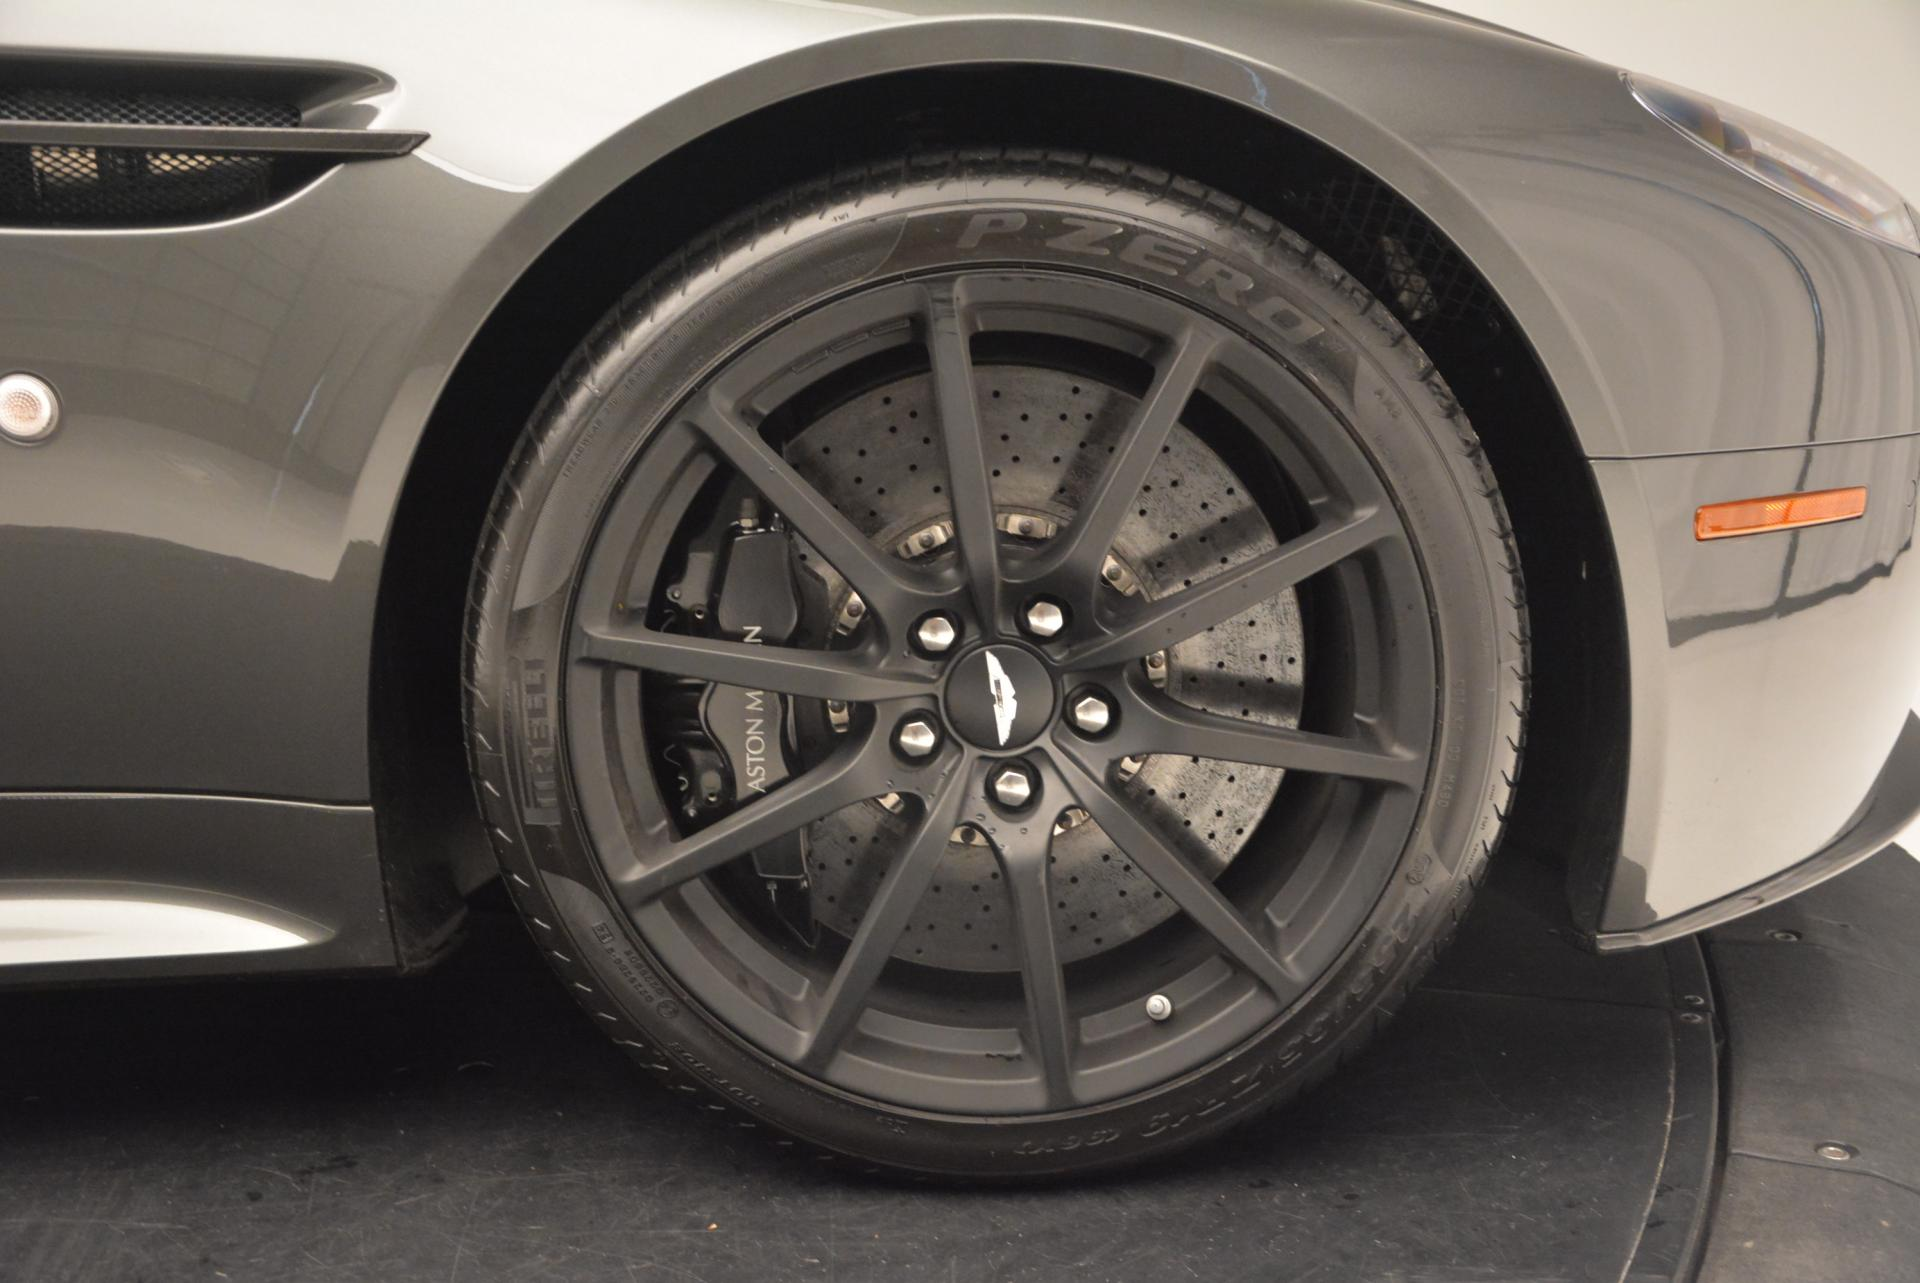 Used 2015 Aston Martin V12 Vantage S  For Sale In Greenwich, CT. Alfa Romeo of Greenwich, 7003 101_p28